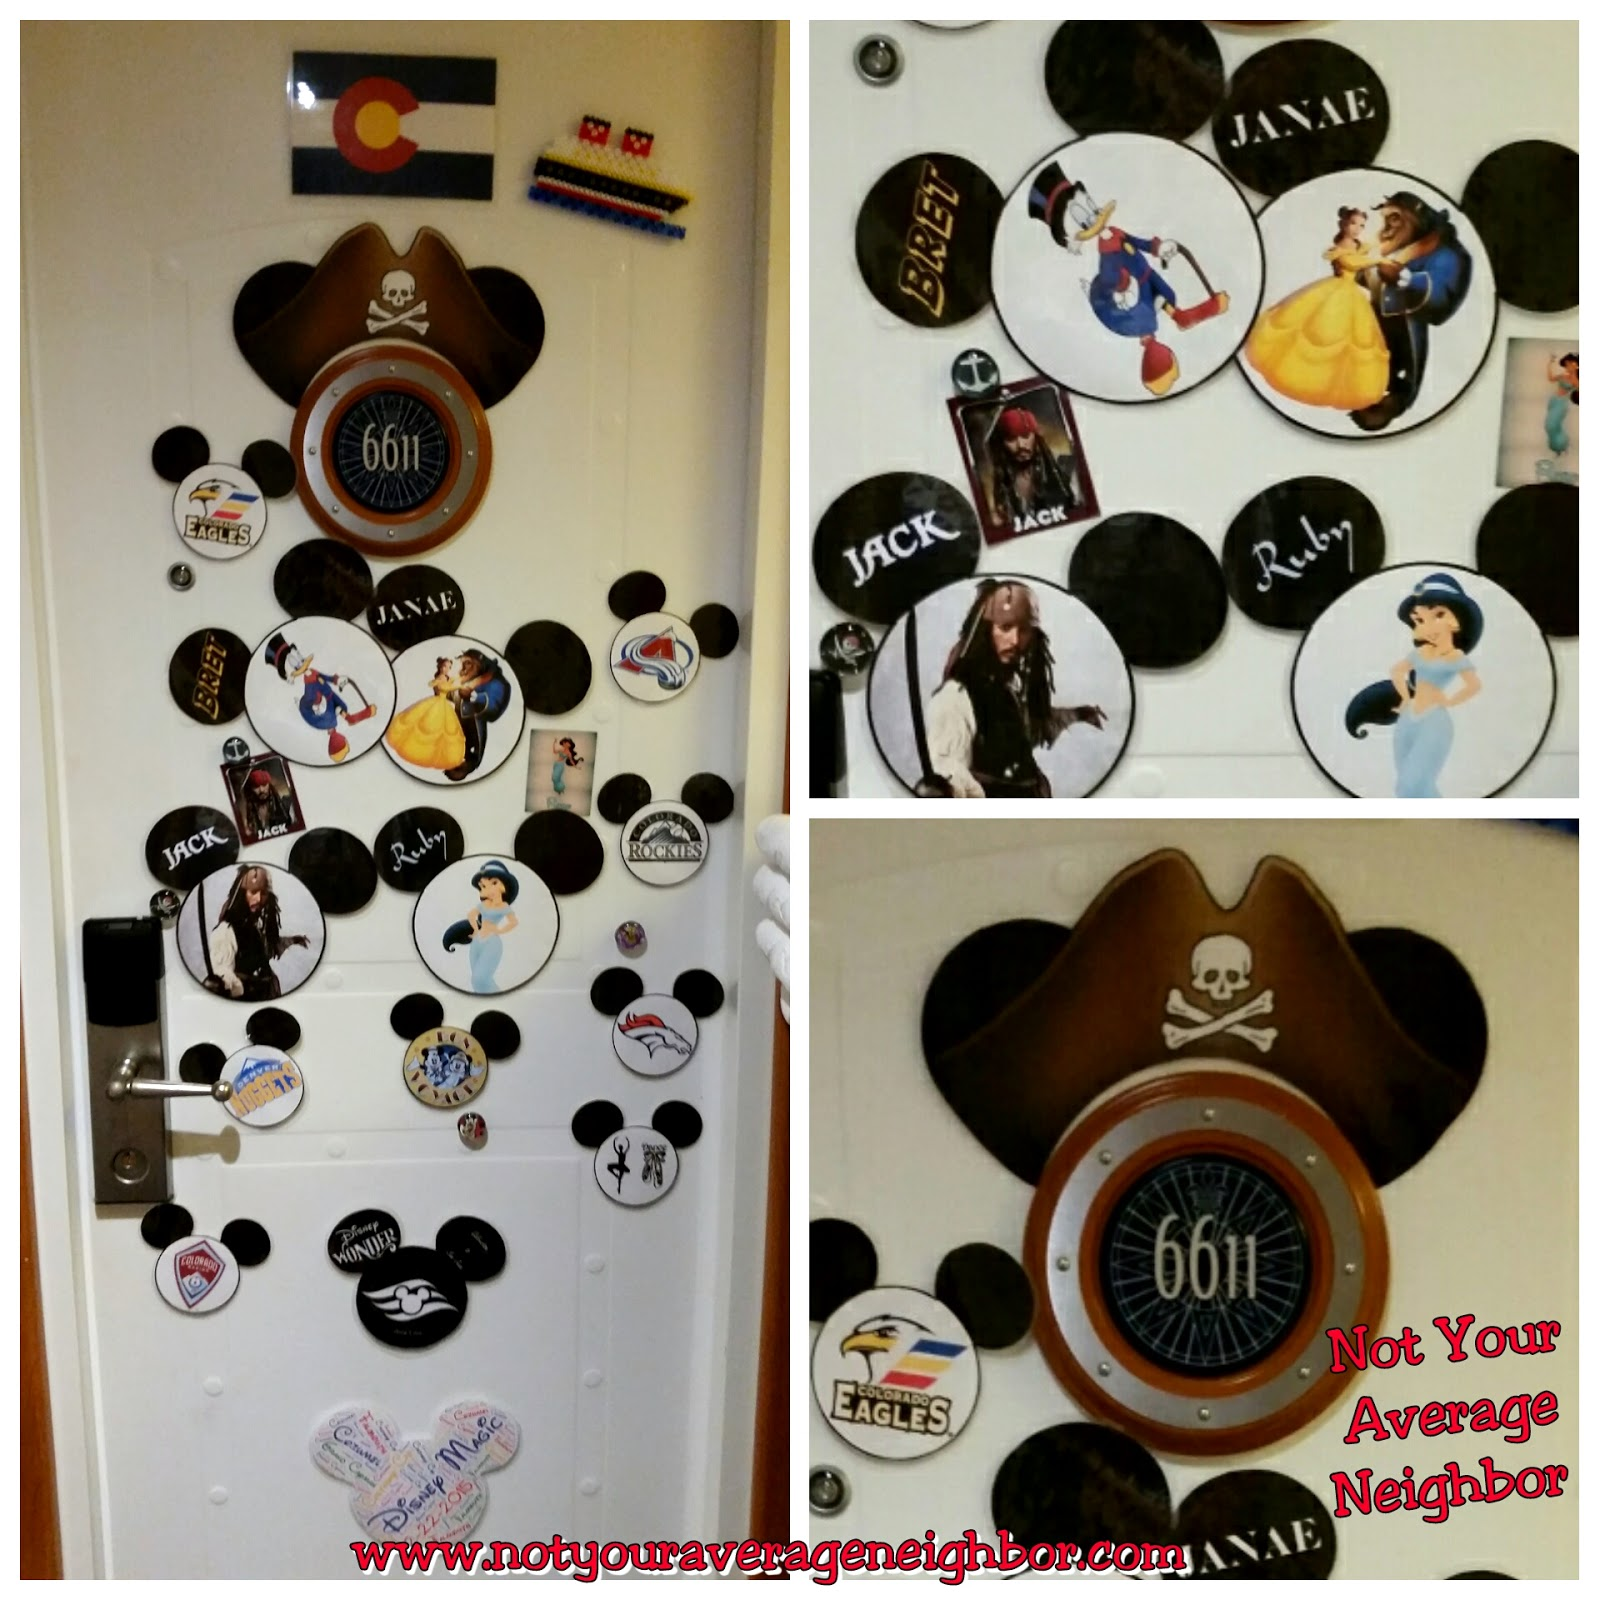 Not Your Average Neighbor Disney Cruise Stateroom Door